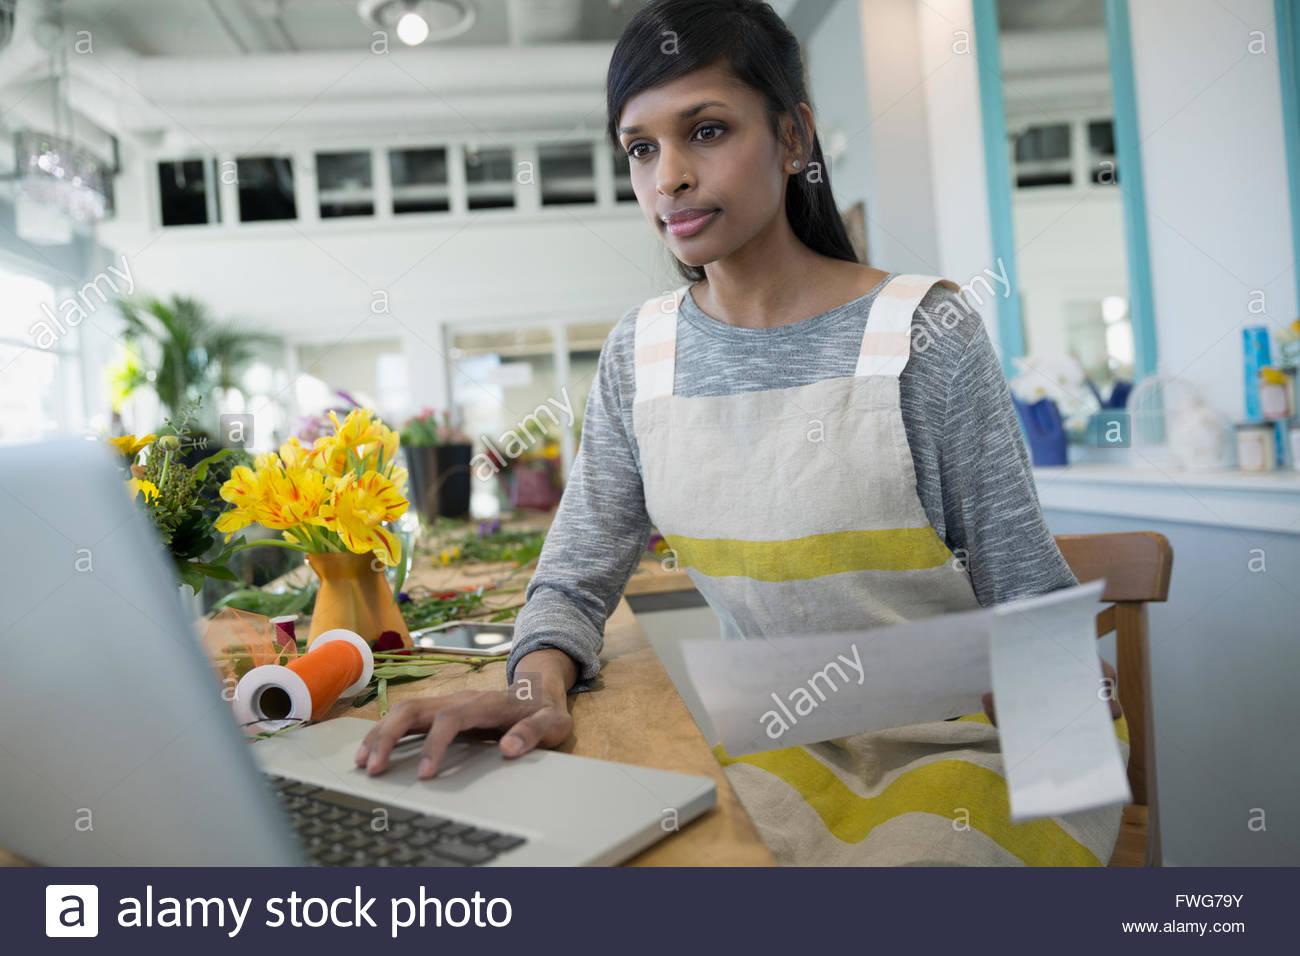 Florist using laptop in flower shop - Stock Image